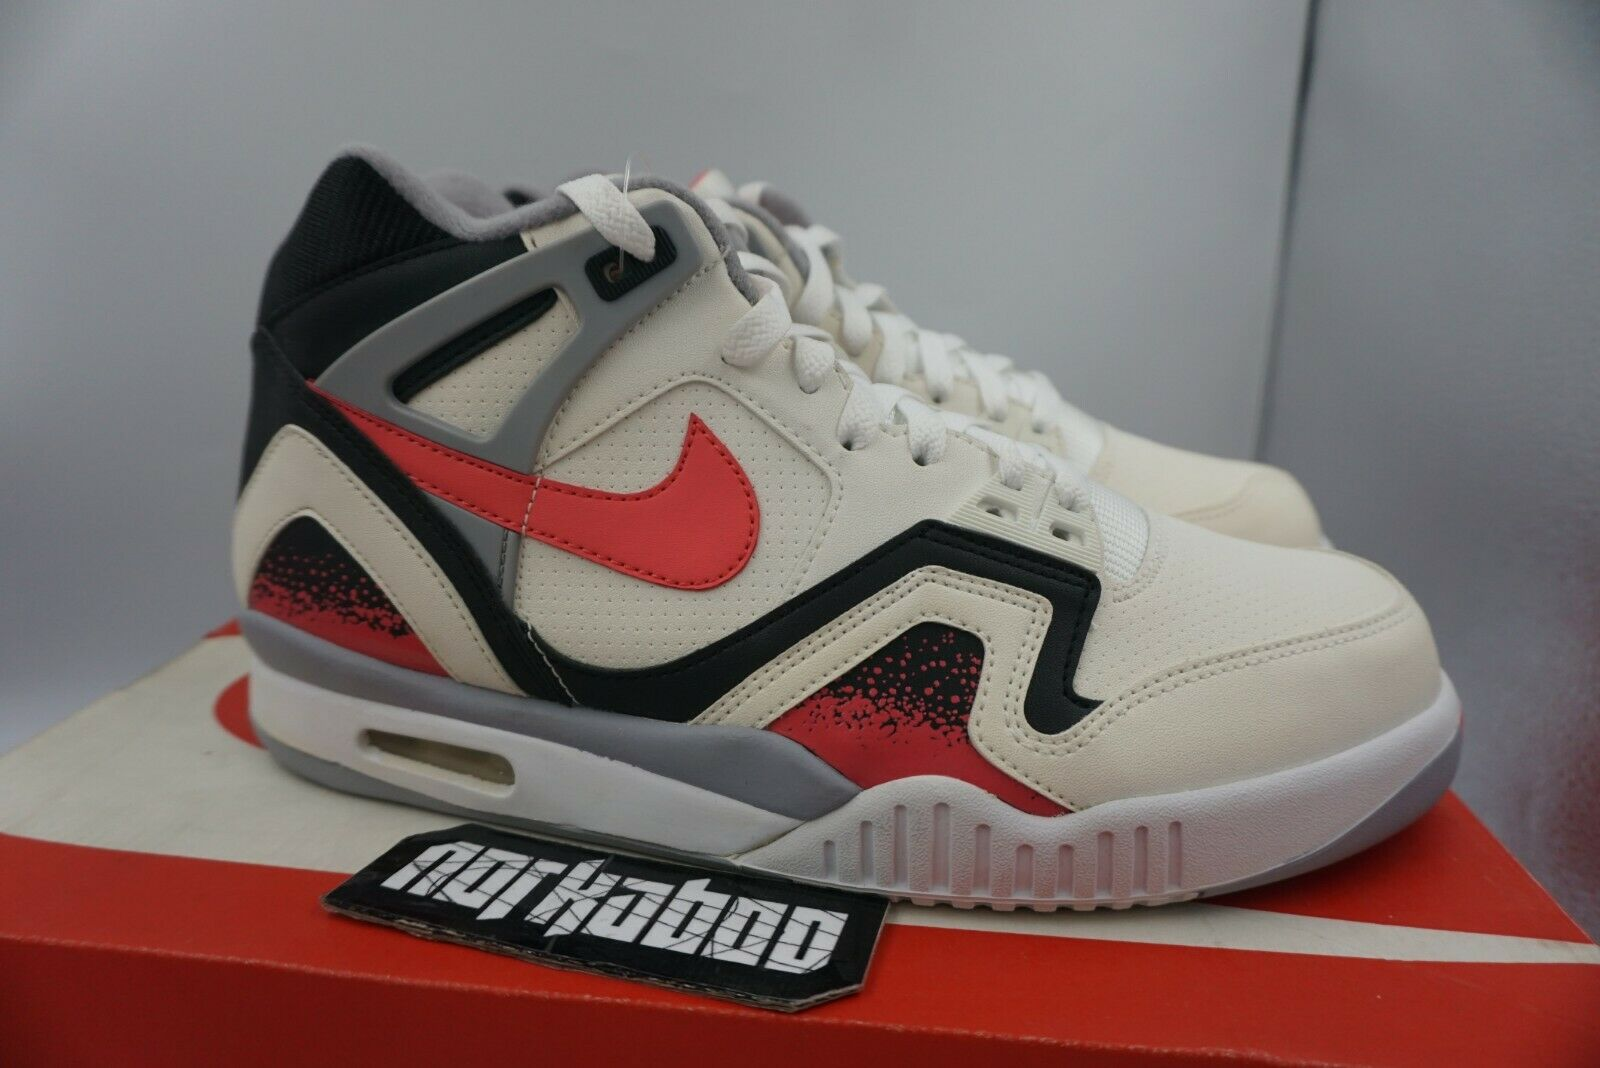 Nike Air Tech Challenge 2 QS Hot Lava White Pink Black 643089-160